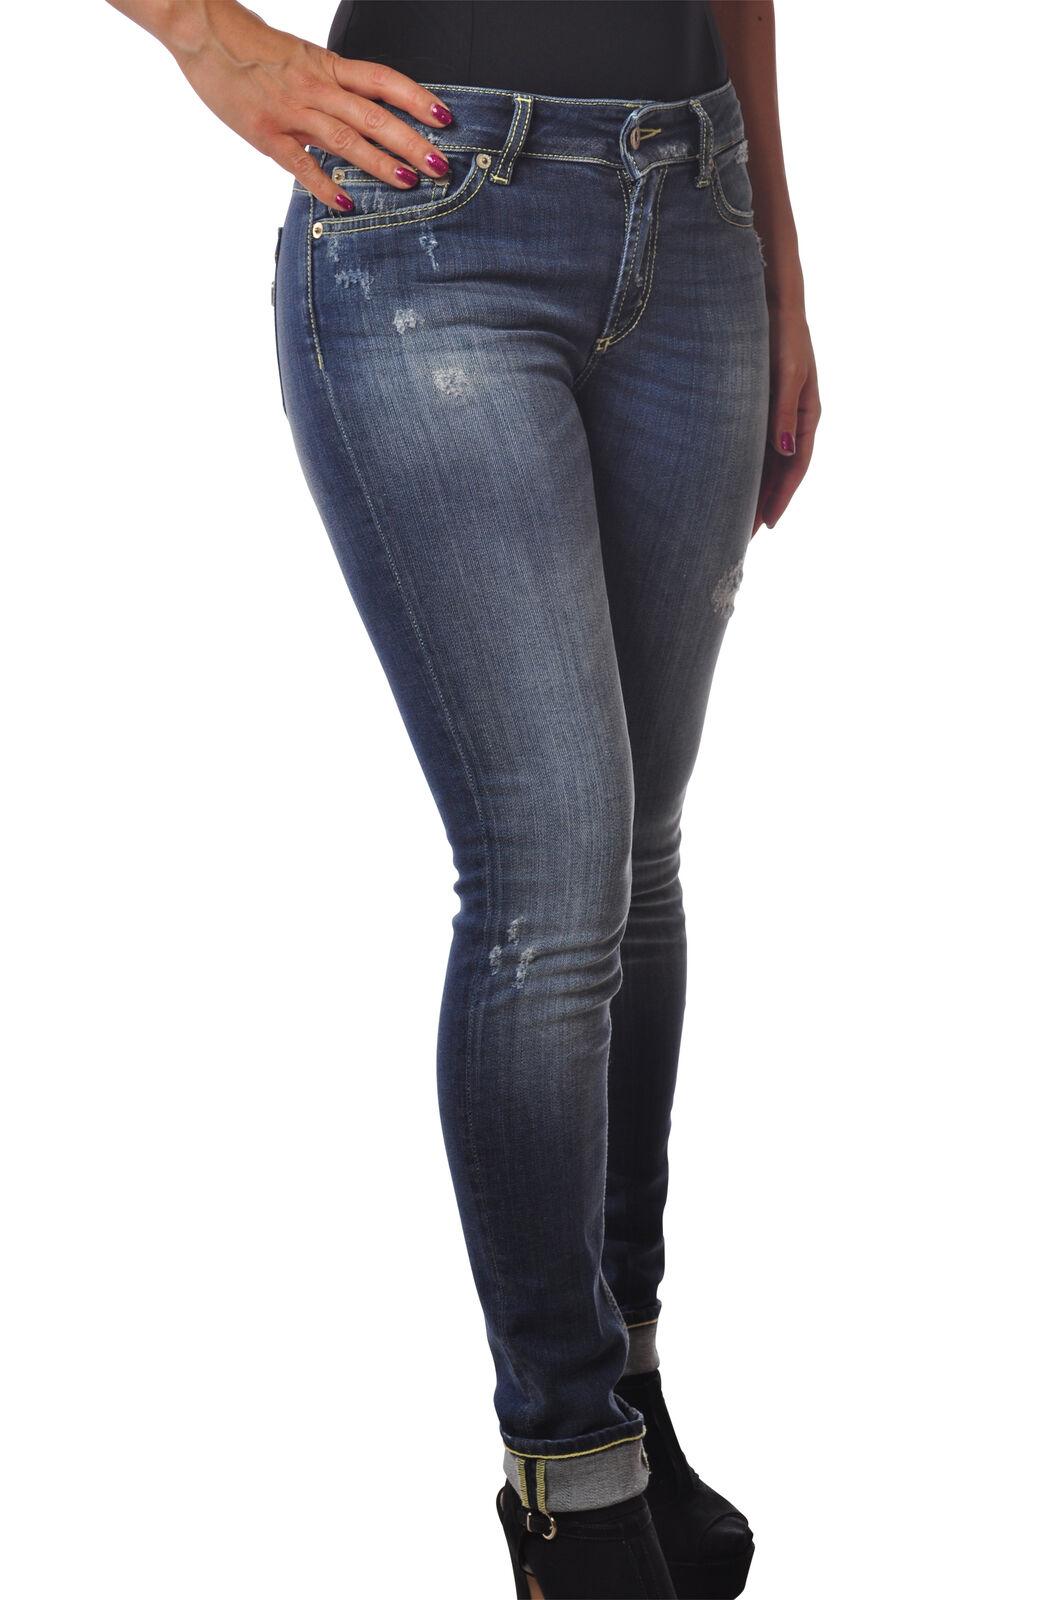 Dondup - Jeans-Pants-slim fit - Woman - Denim - 5357520N183645